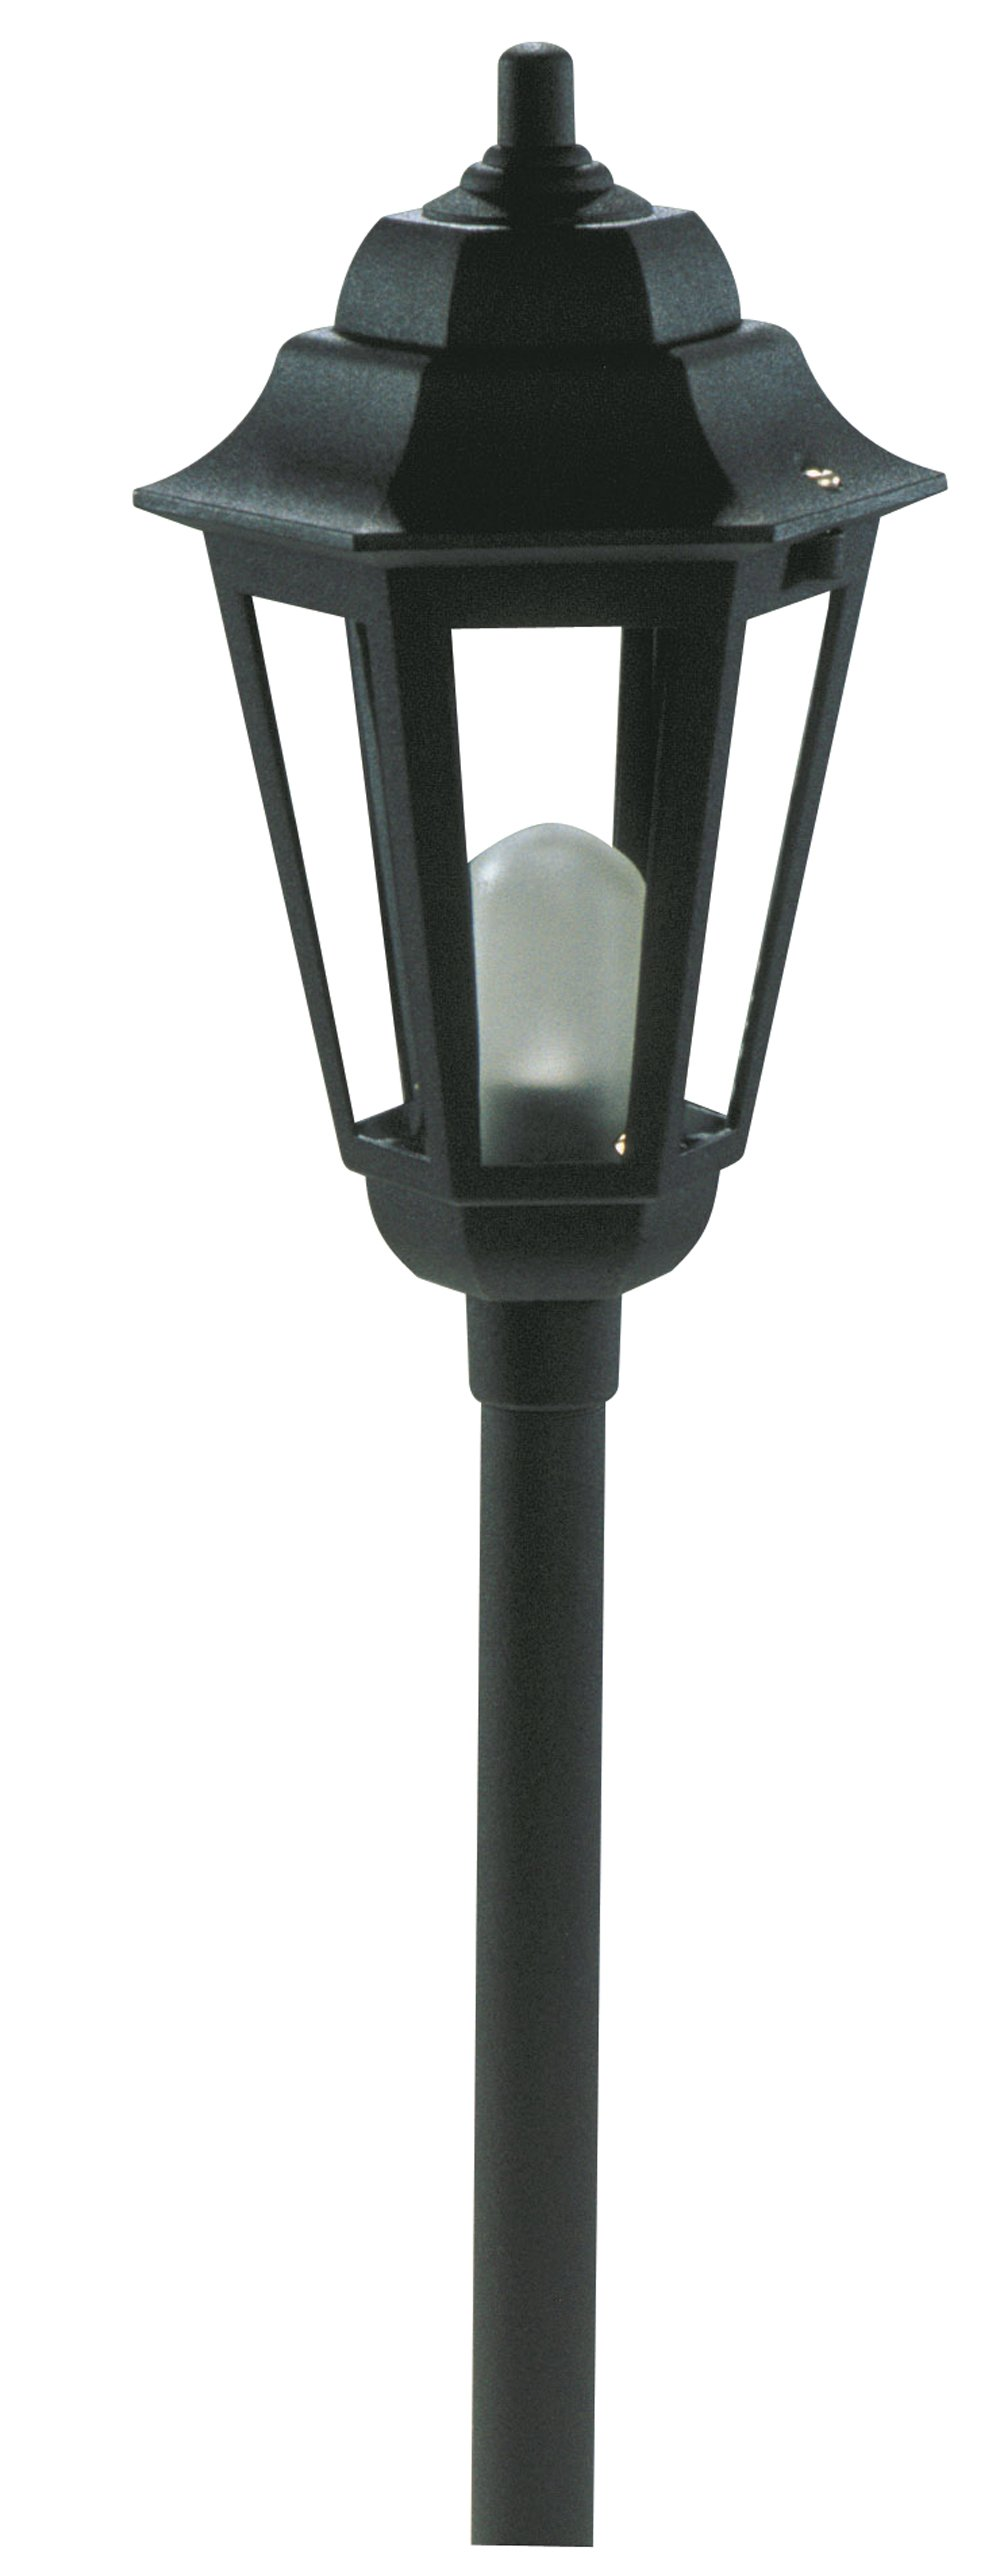 Paradise by Sterno Home Low Voltage Cast Aluminum 10-Watt Halogen Savana Post Fixture, Black